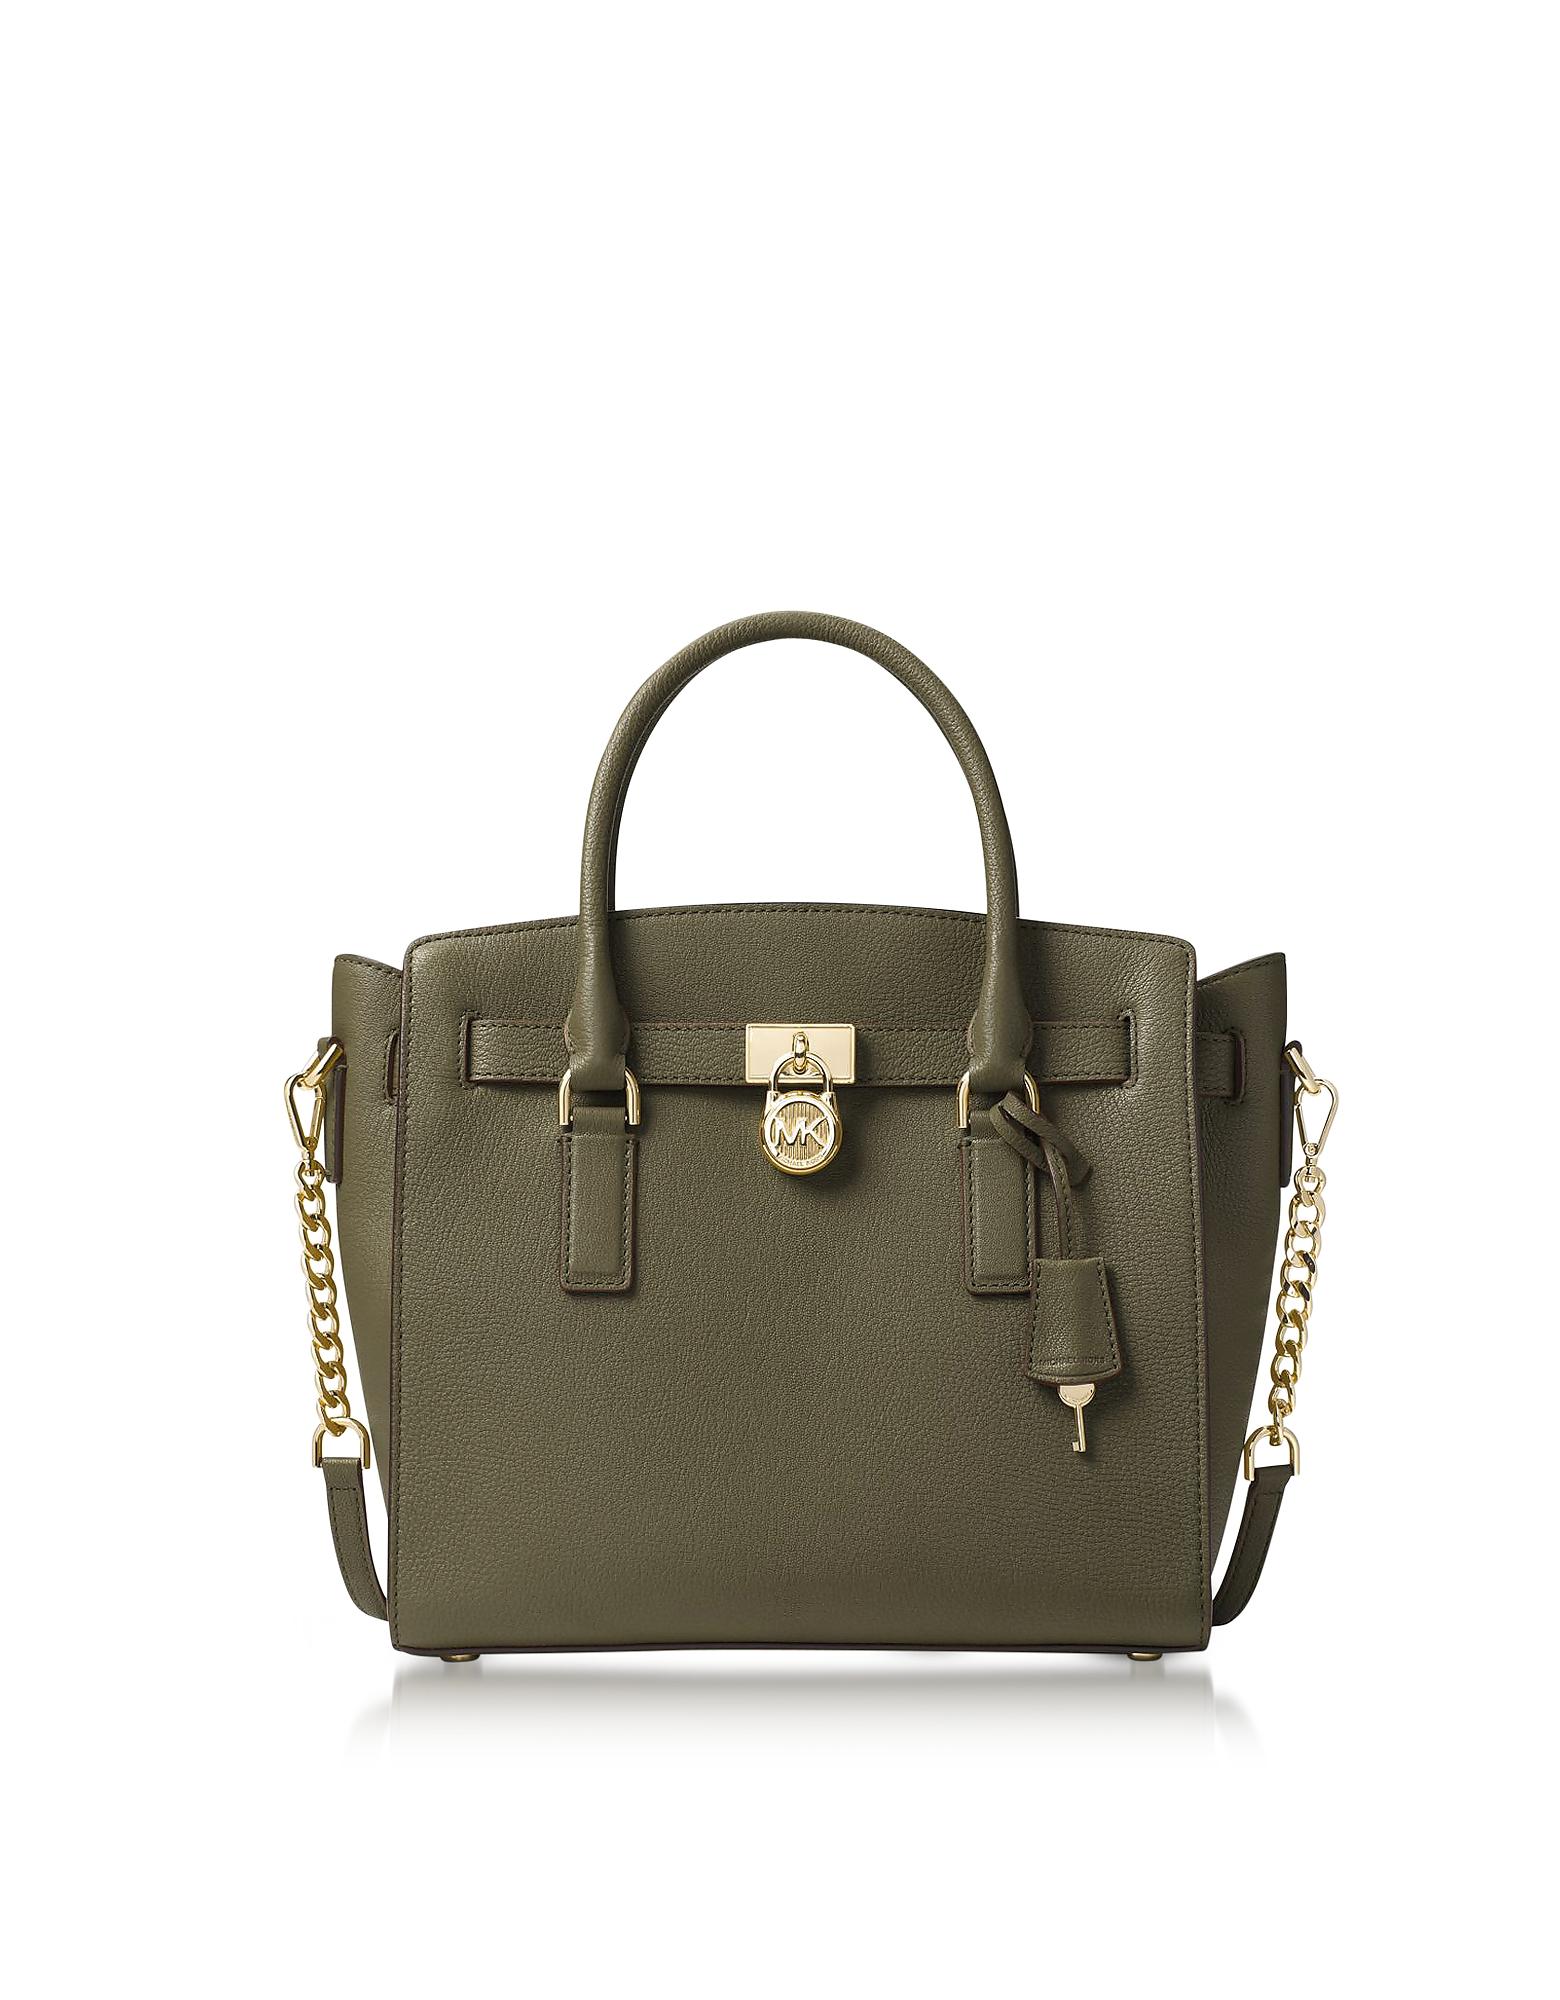 Michael Kors Handbags, Hamilton Large Olive Green Pebbled Leather Satchel Bag